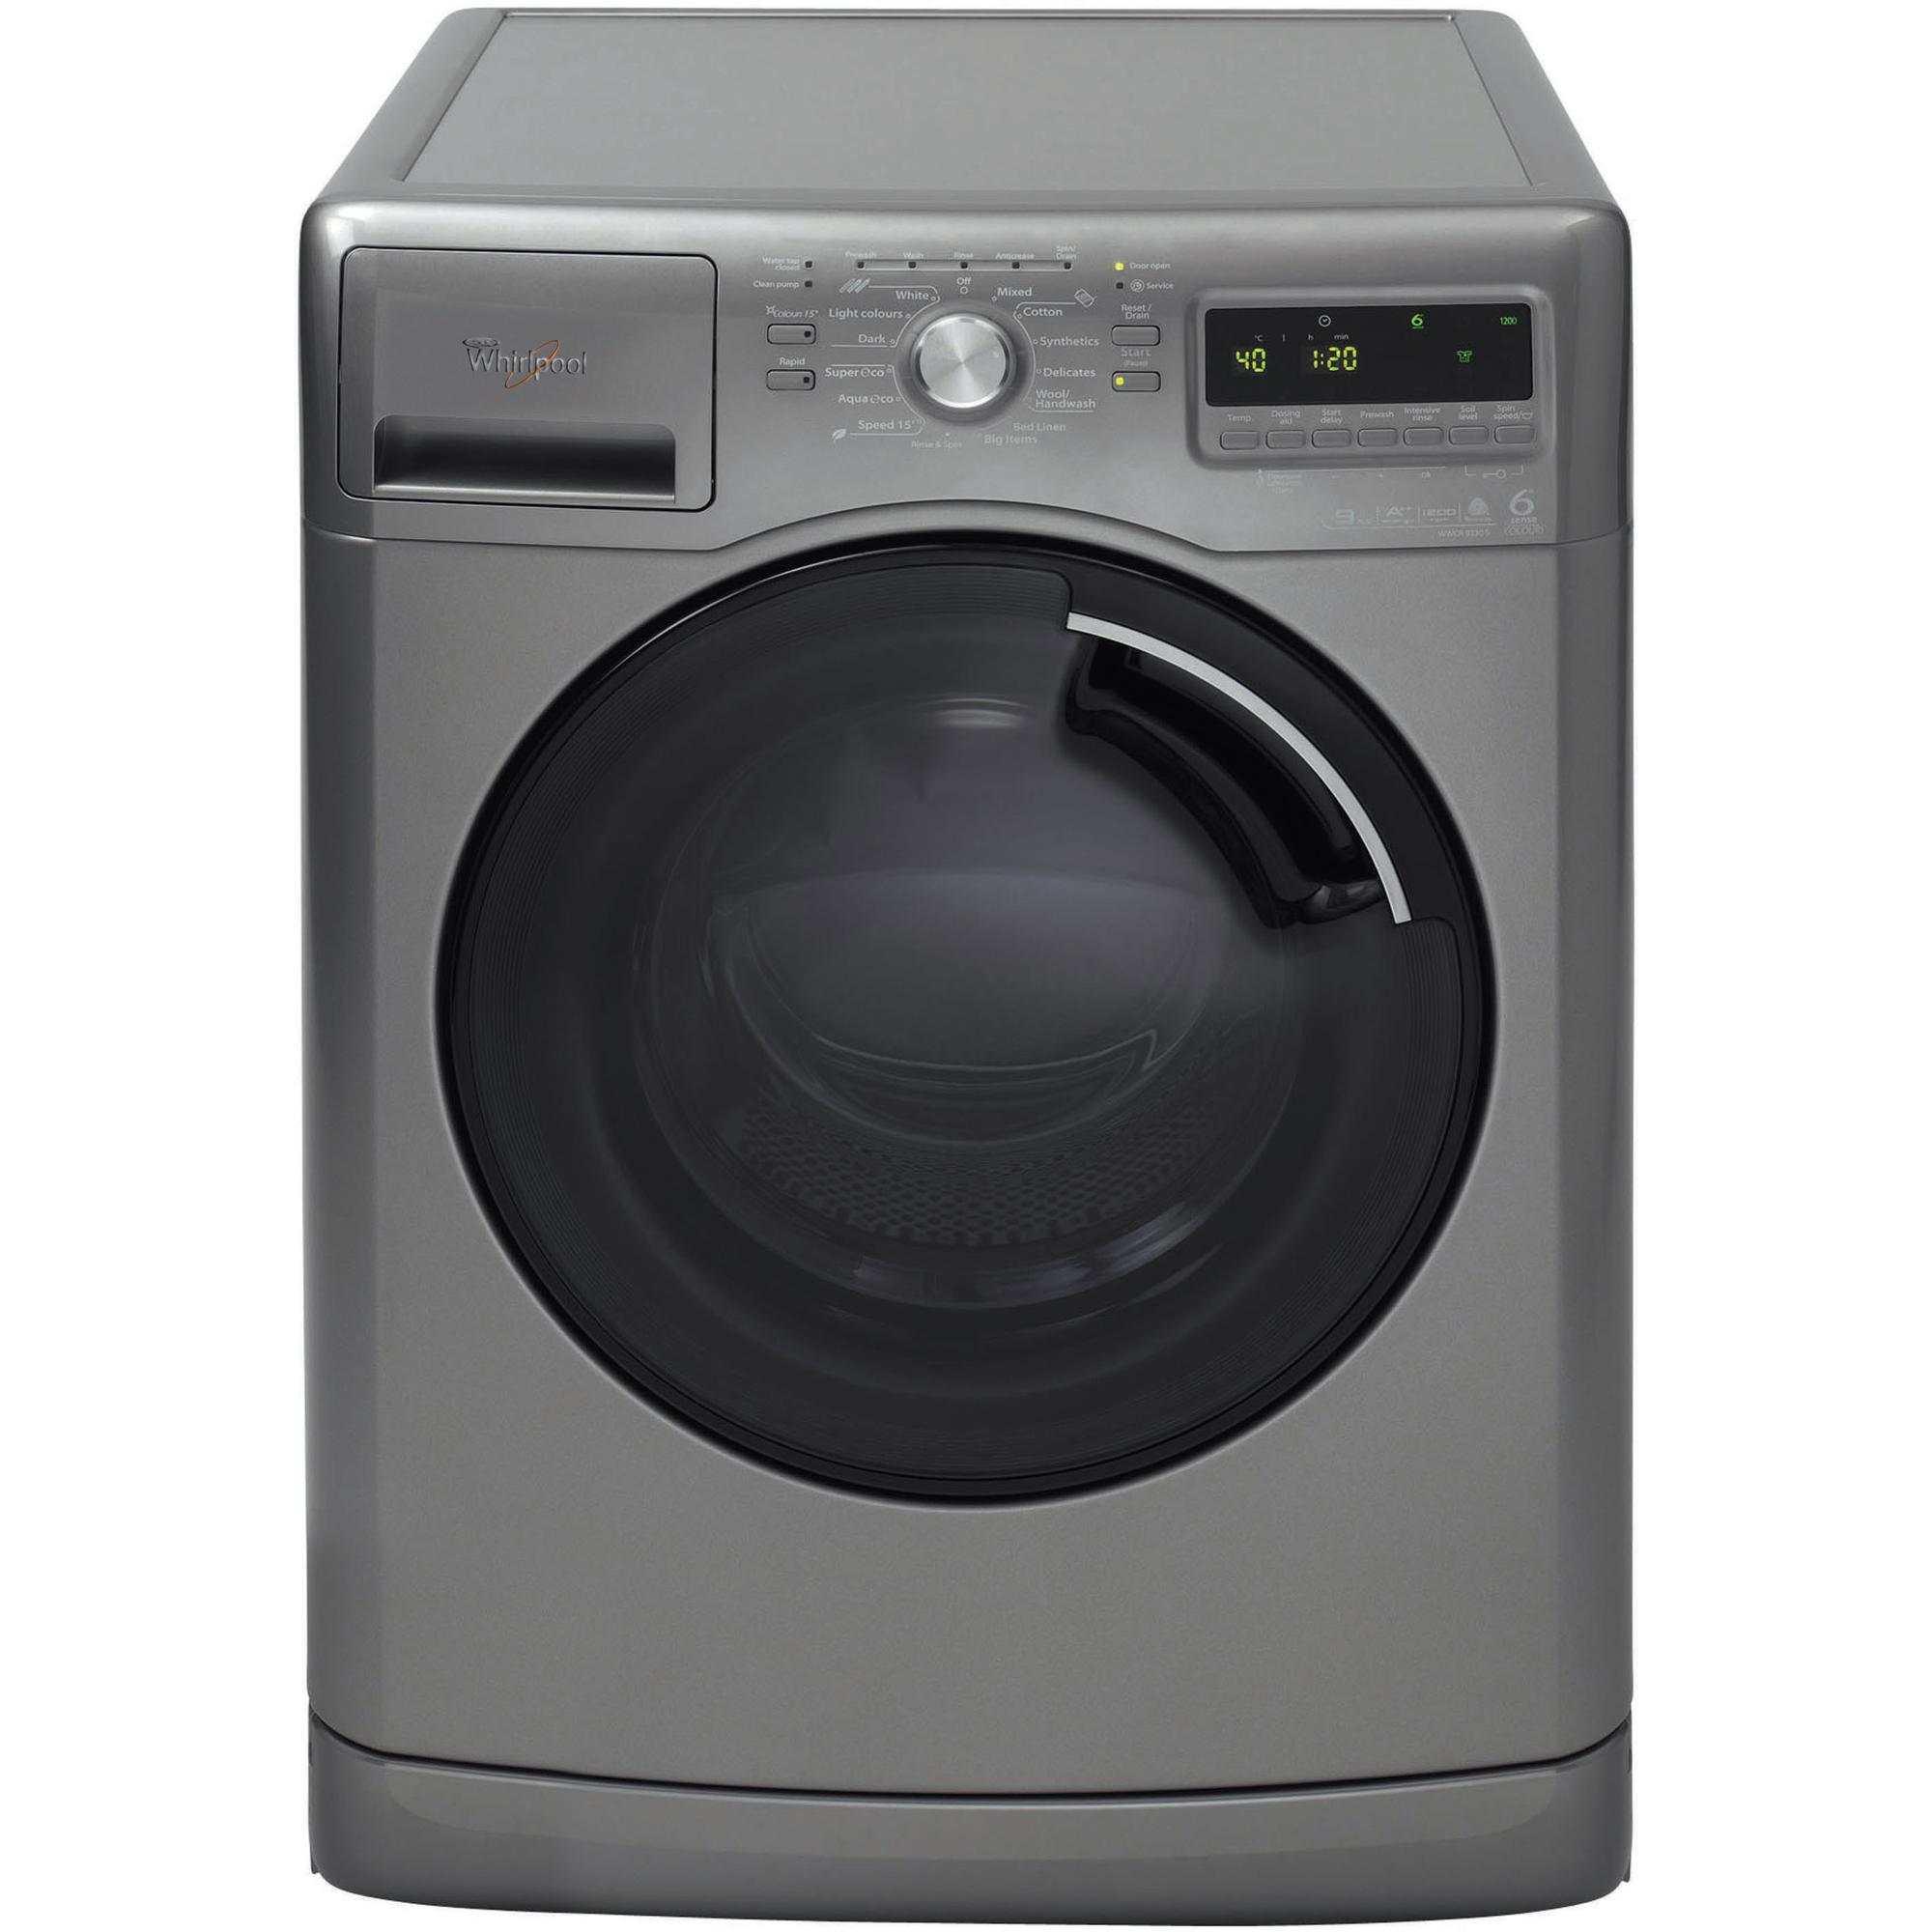 Buy Washing Machines in London - Whirlpool WWCR9230/1S ...